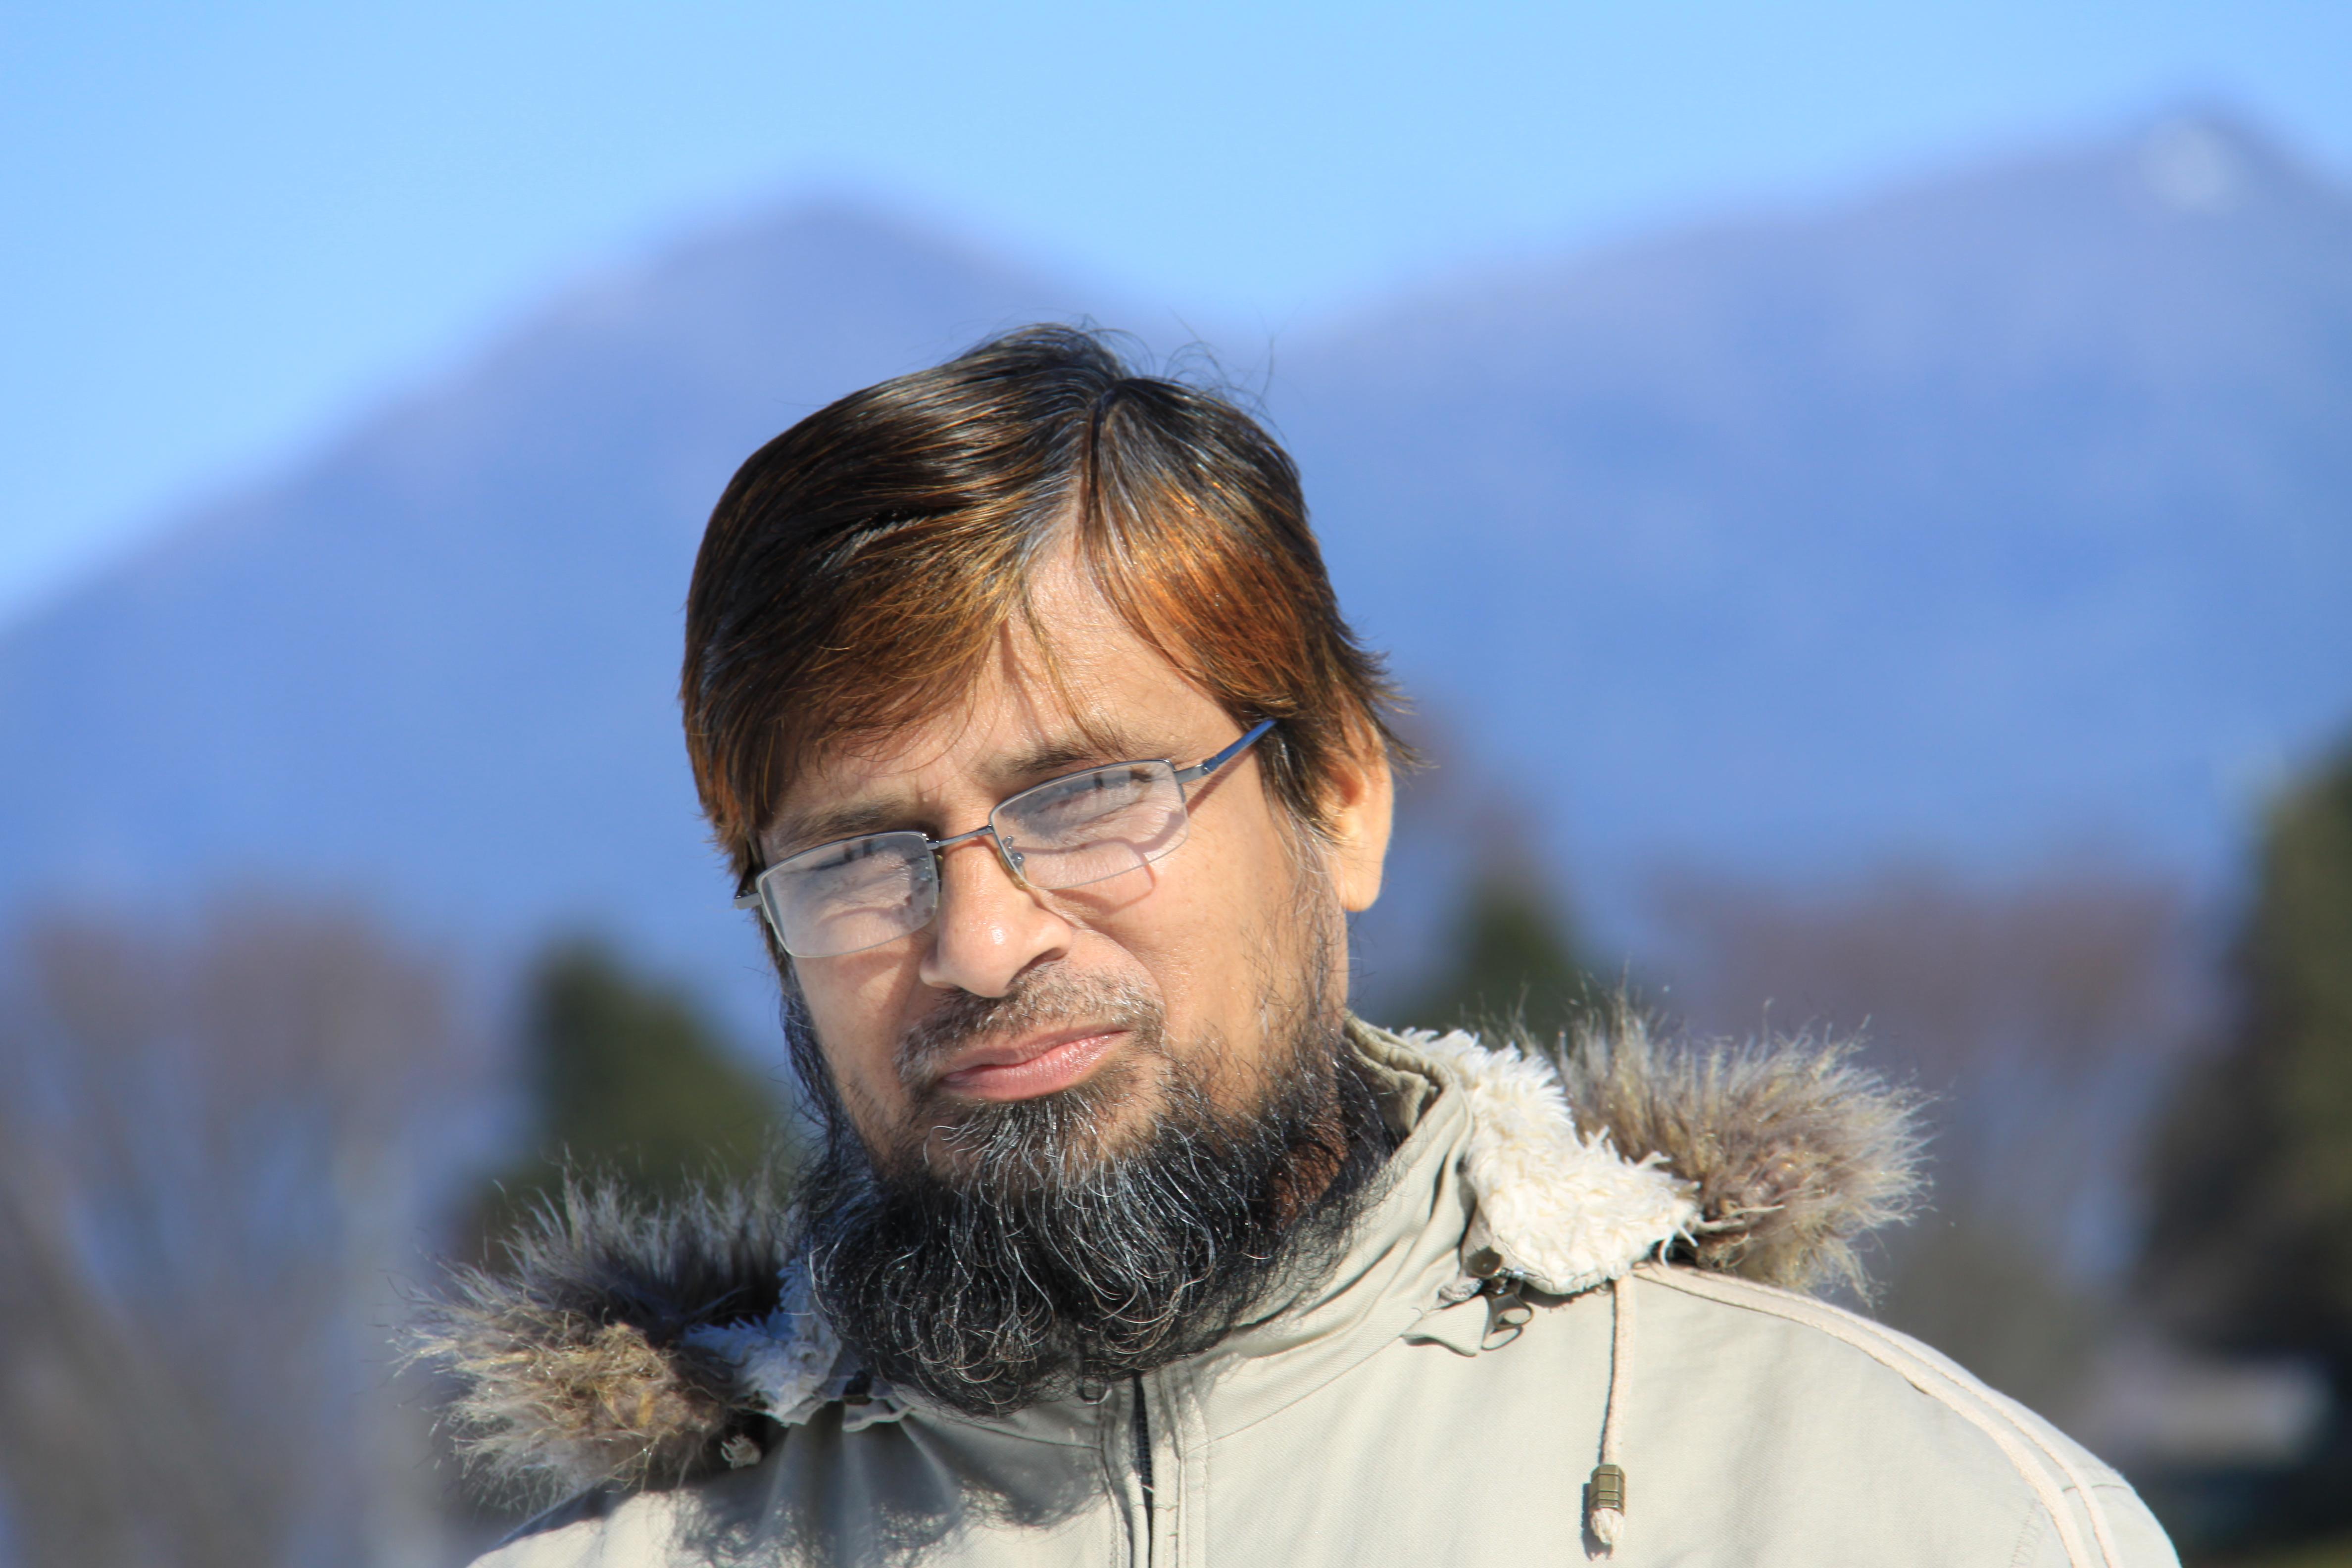 Dr. Md. Khairul Hassan Bhuiyan